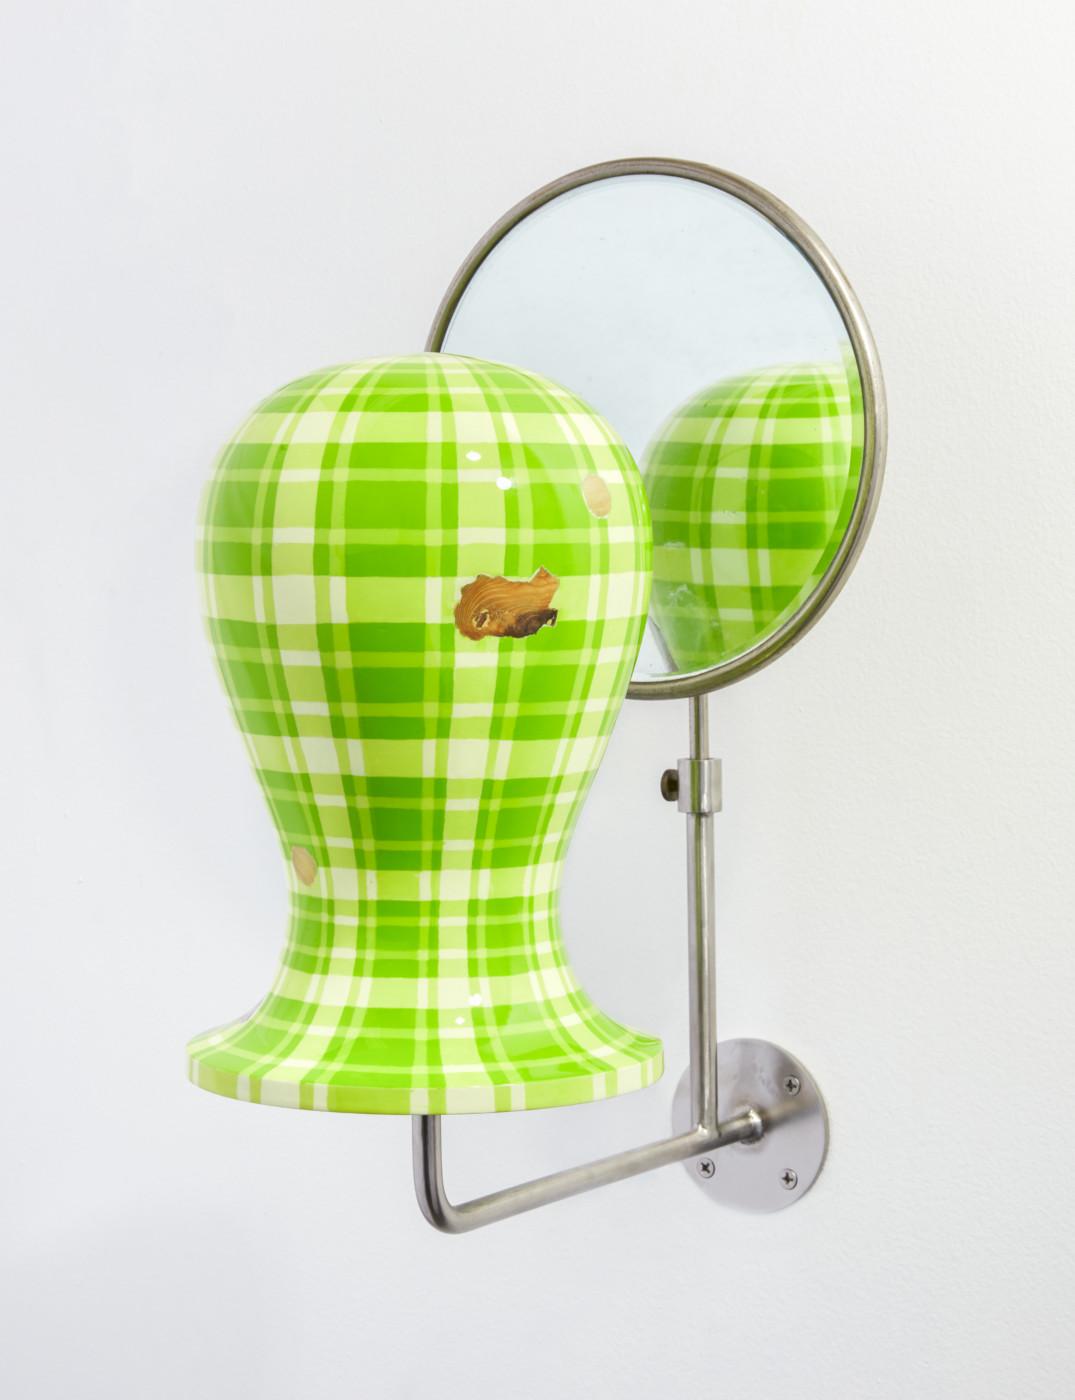 TÊTE  Tête fig. 3</I>, 2019 Acrylic, enamel, wood, steel, mirror 51.5 x 20 x 38.5 cm / 20 1/4 x 7 7/8 x 15 1/8 in  ORION MARTIN